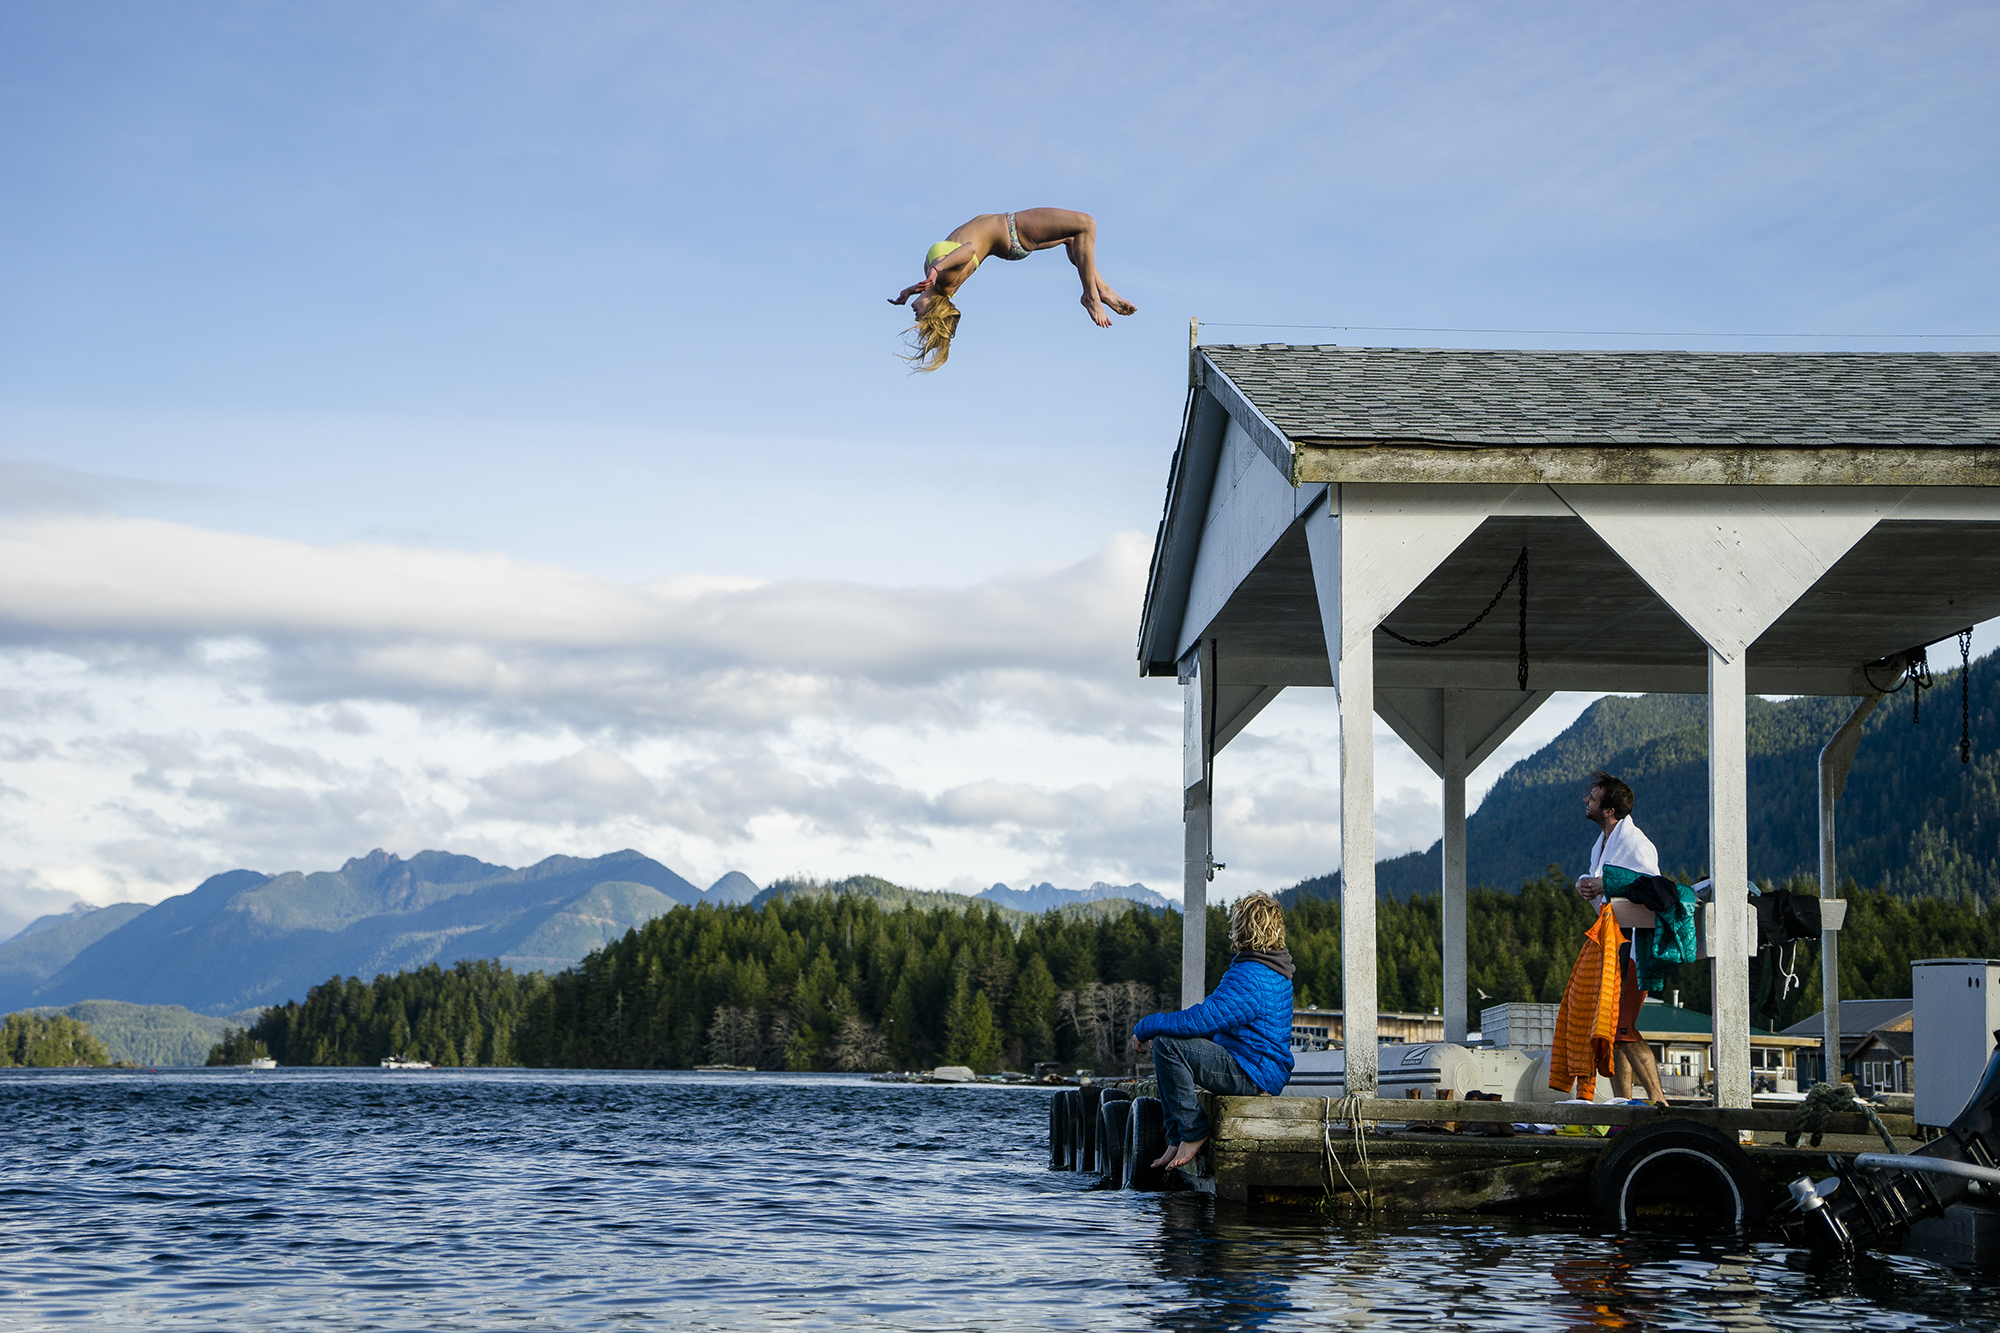 Kaki Orr, David Carrier Porcheron and Callum Pettit. Vancouver Island, British Columbia. Photography by Chris Burkard.